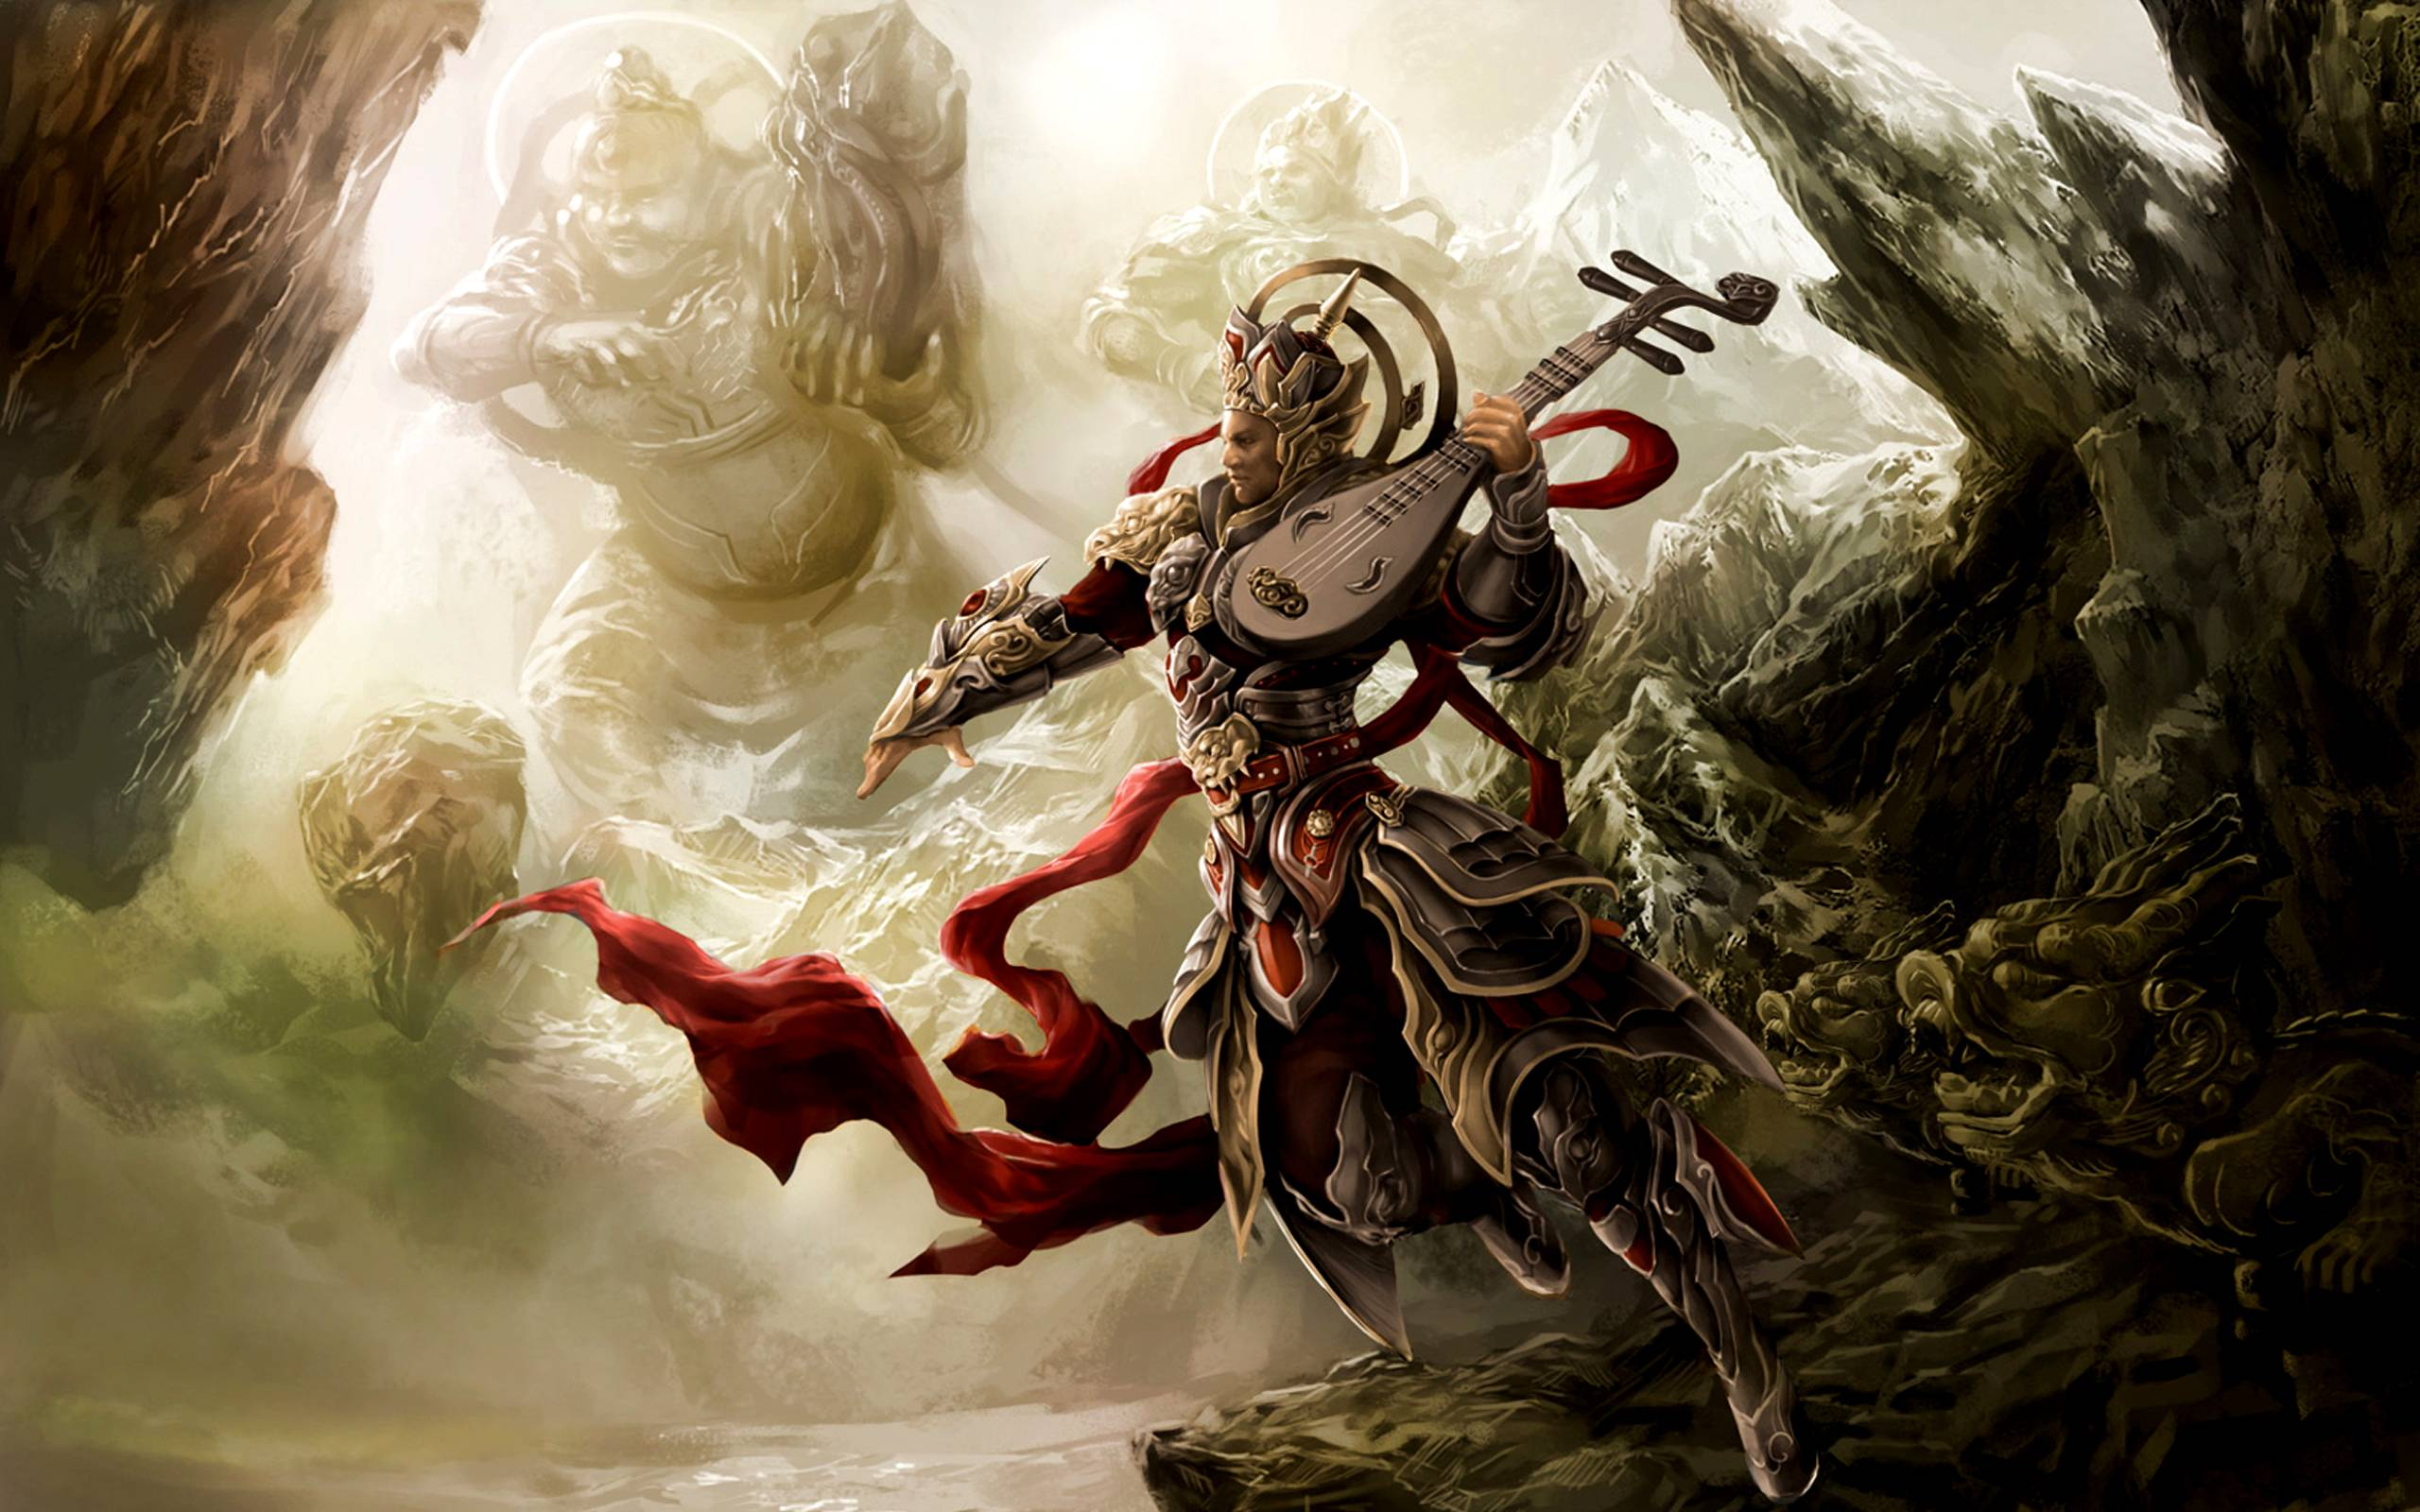 Fantasy Warrior Wallpaper Hd King Of Snakes Vasuki 452100 Hd Wallpaper Backgrounds Download